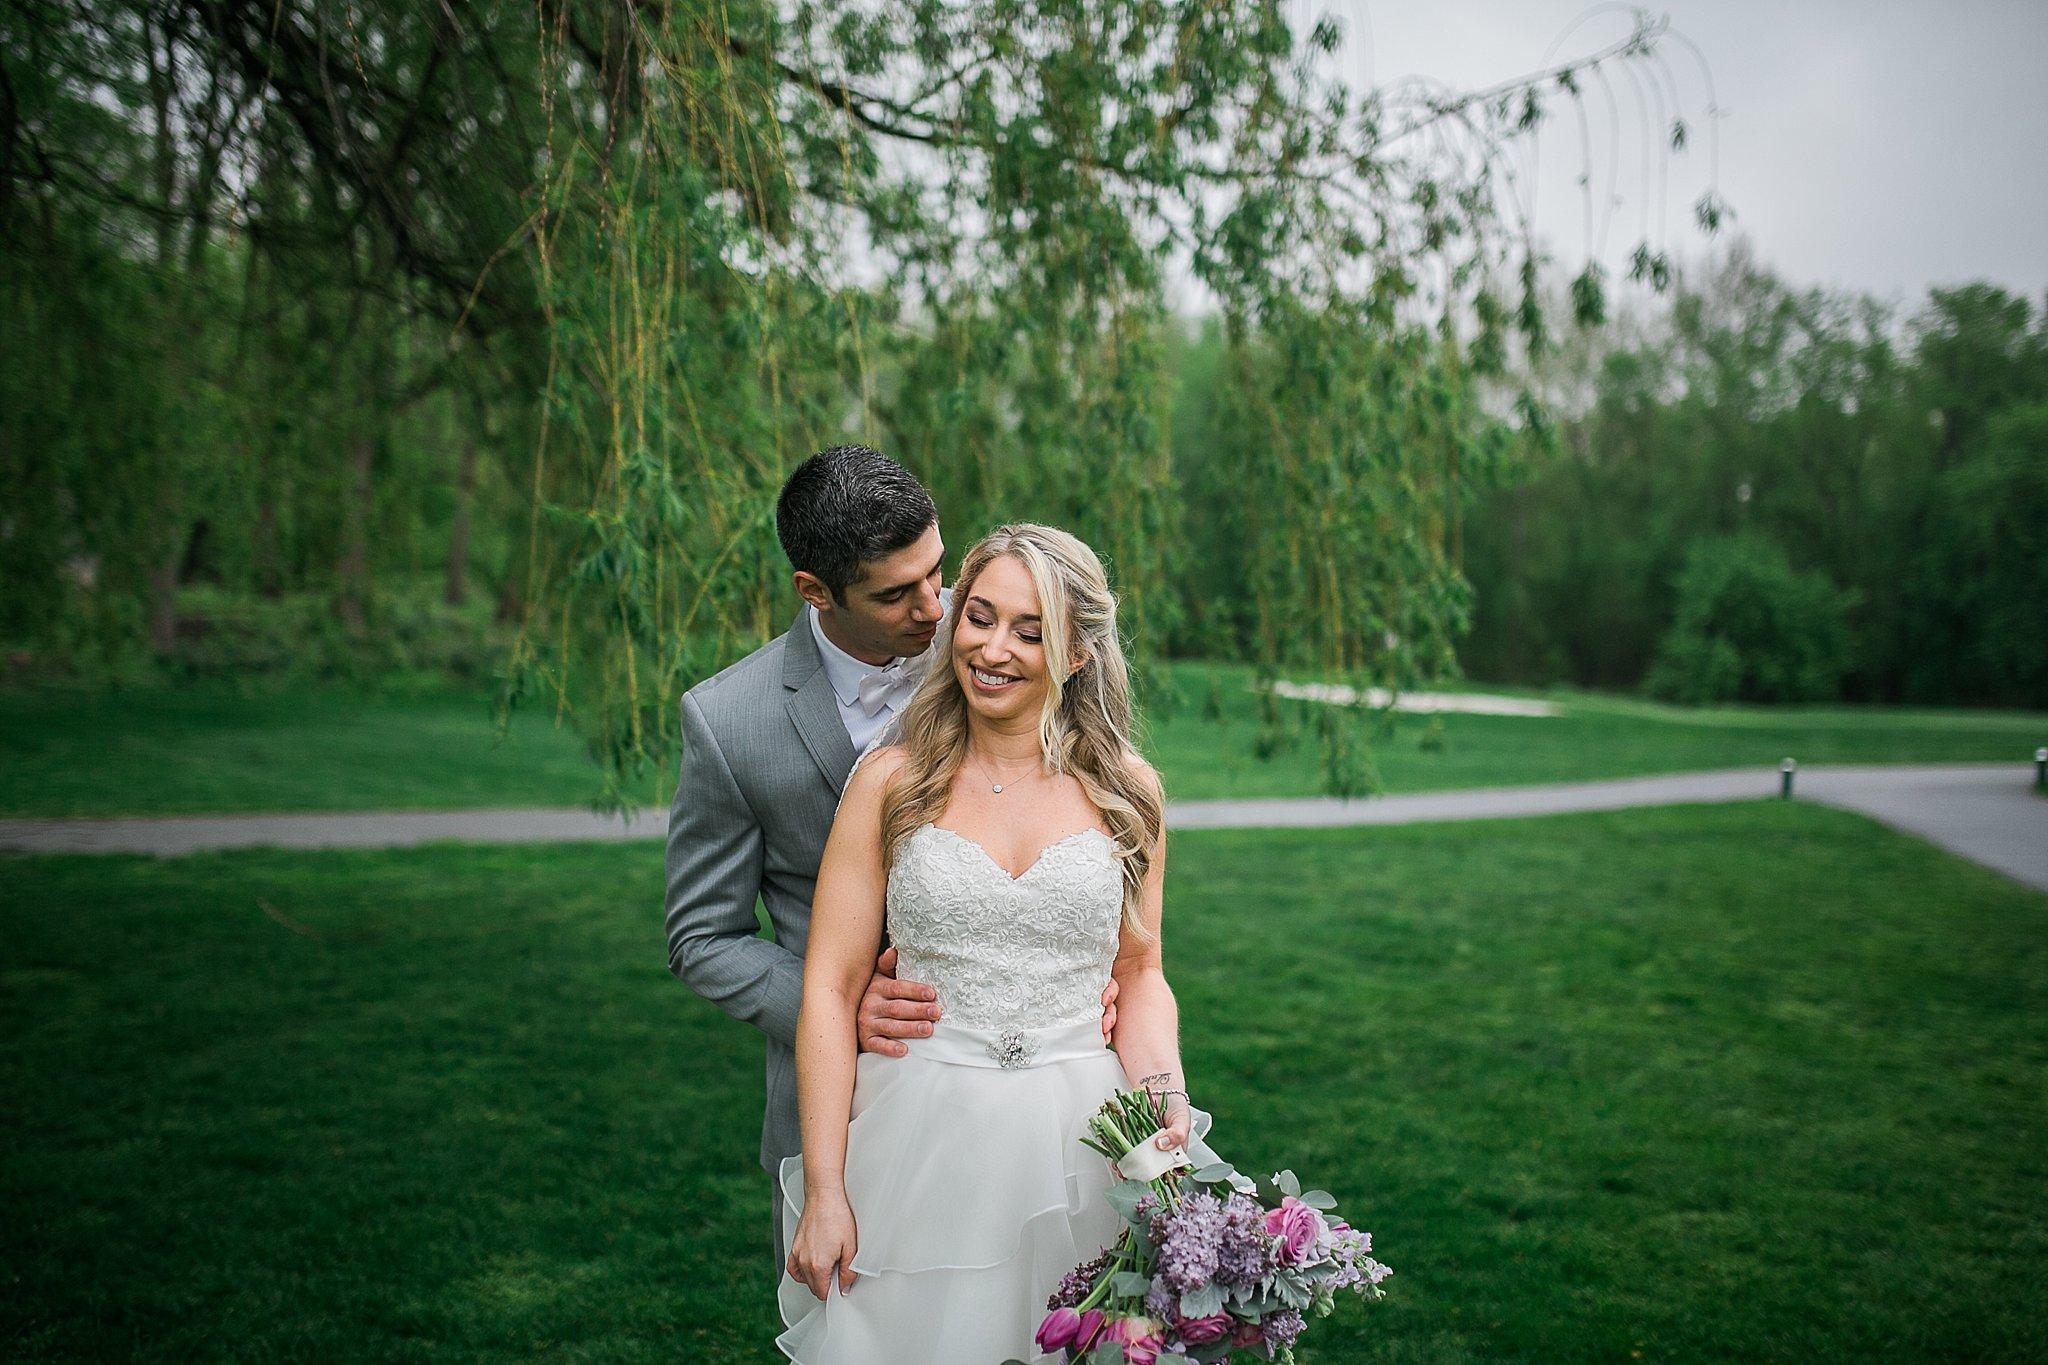 West Hills Country Club Wedding Hudson Valley Wedding Photographer Sweet Alice Photography 73.jpg